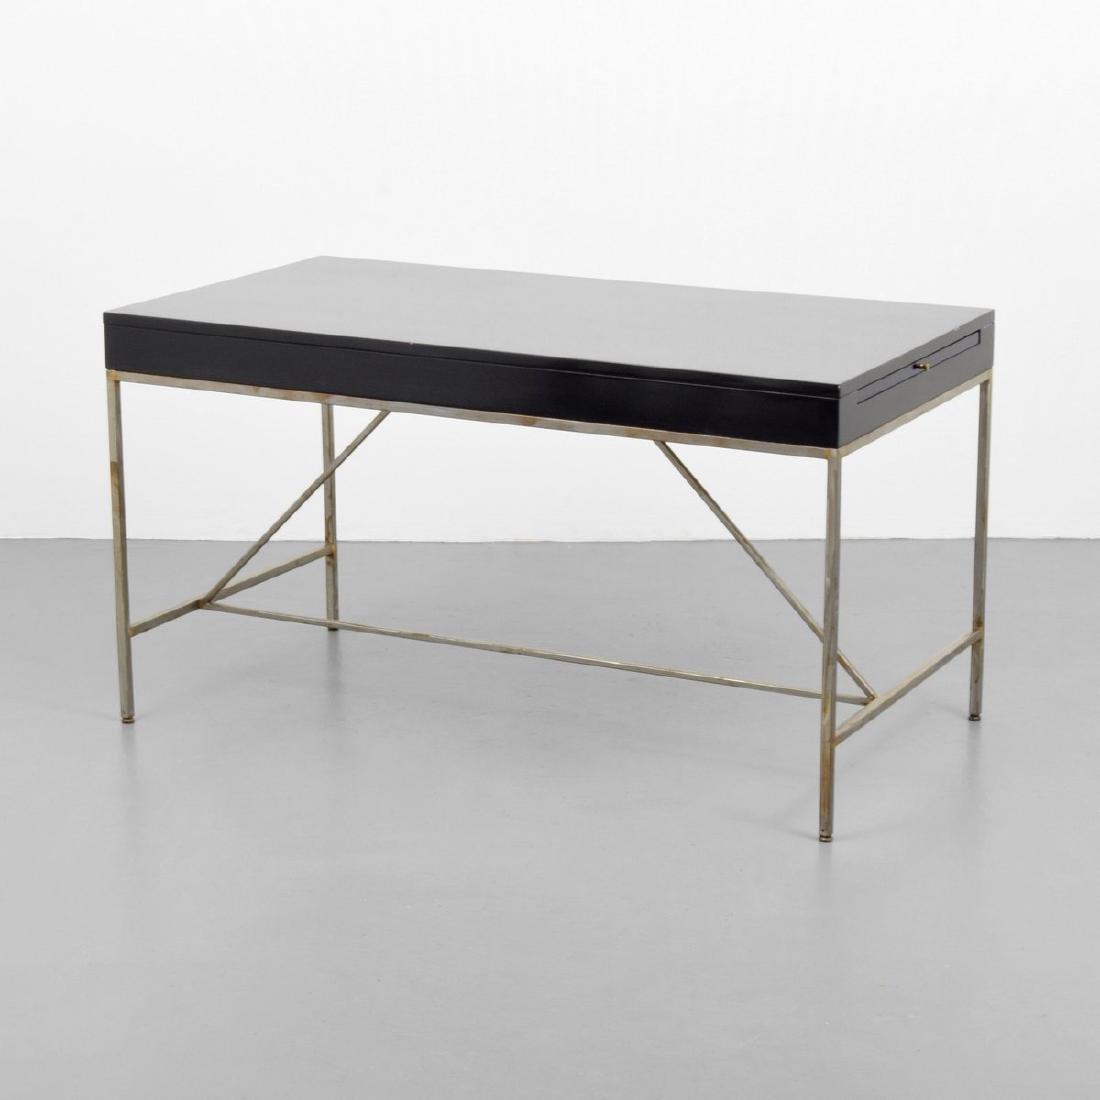 Paul McCobb Table/Desk